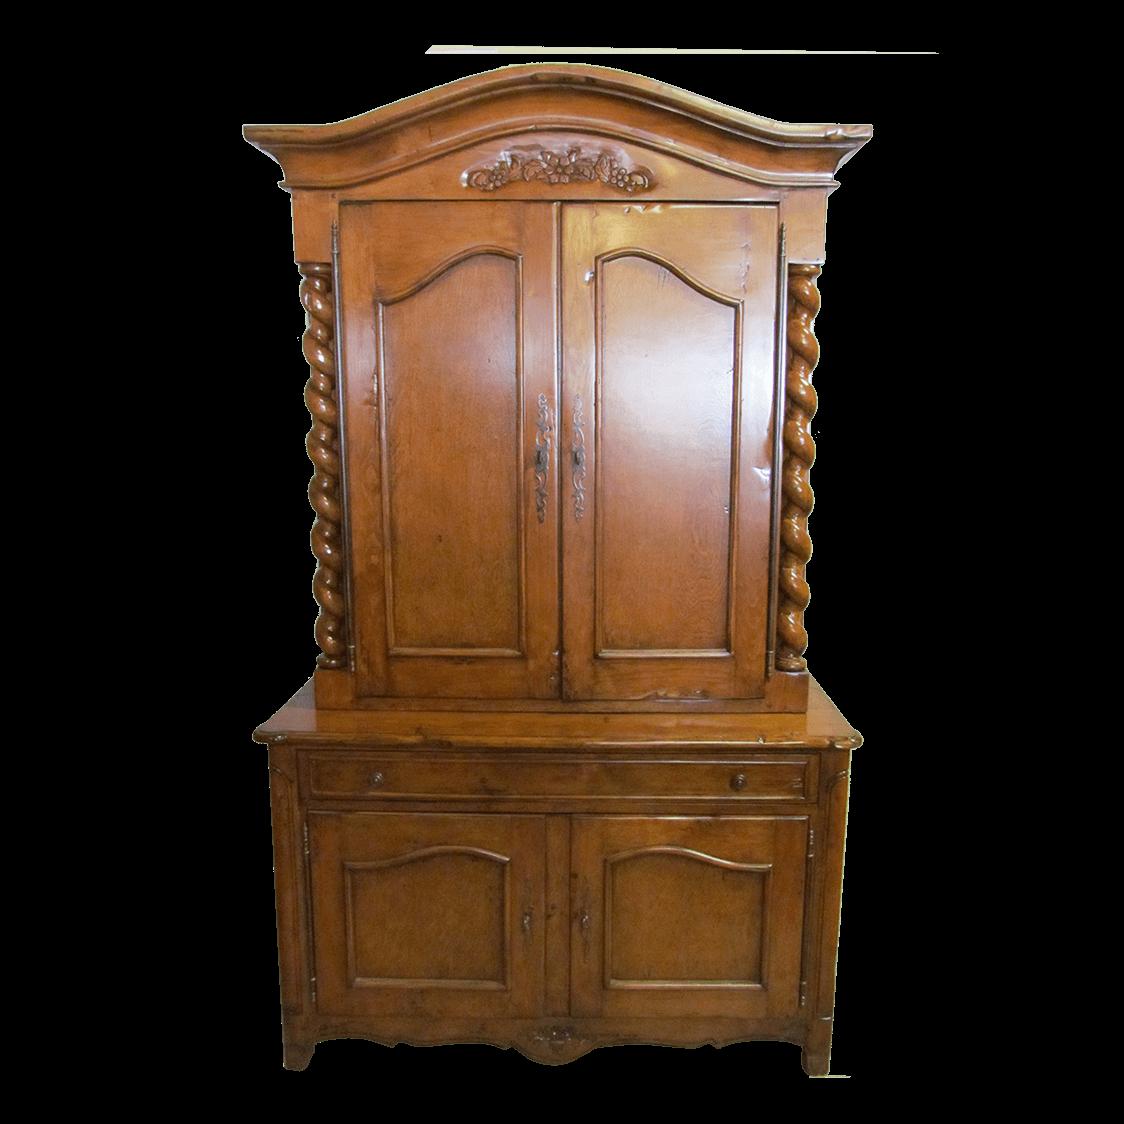 226167_Antique_Designs_Armoire